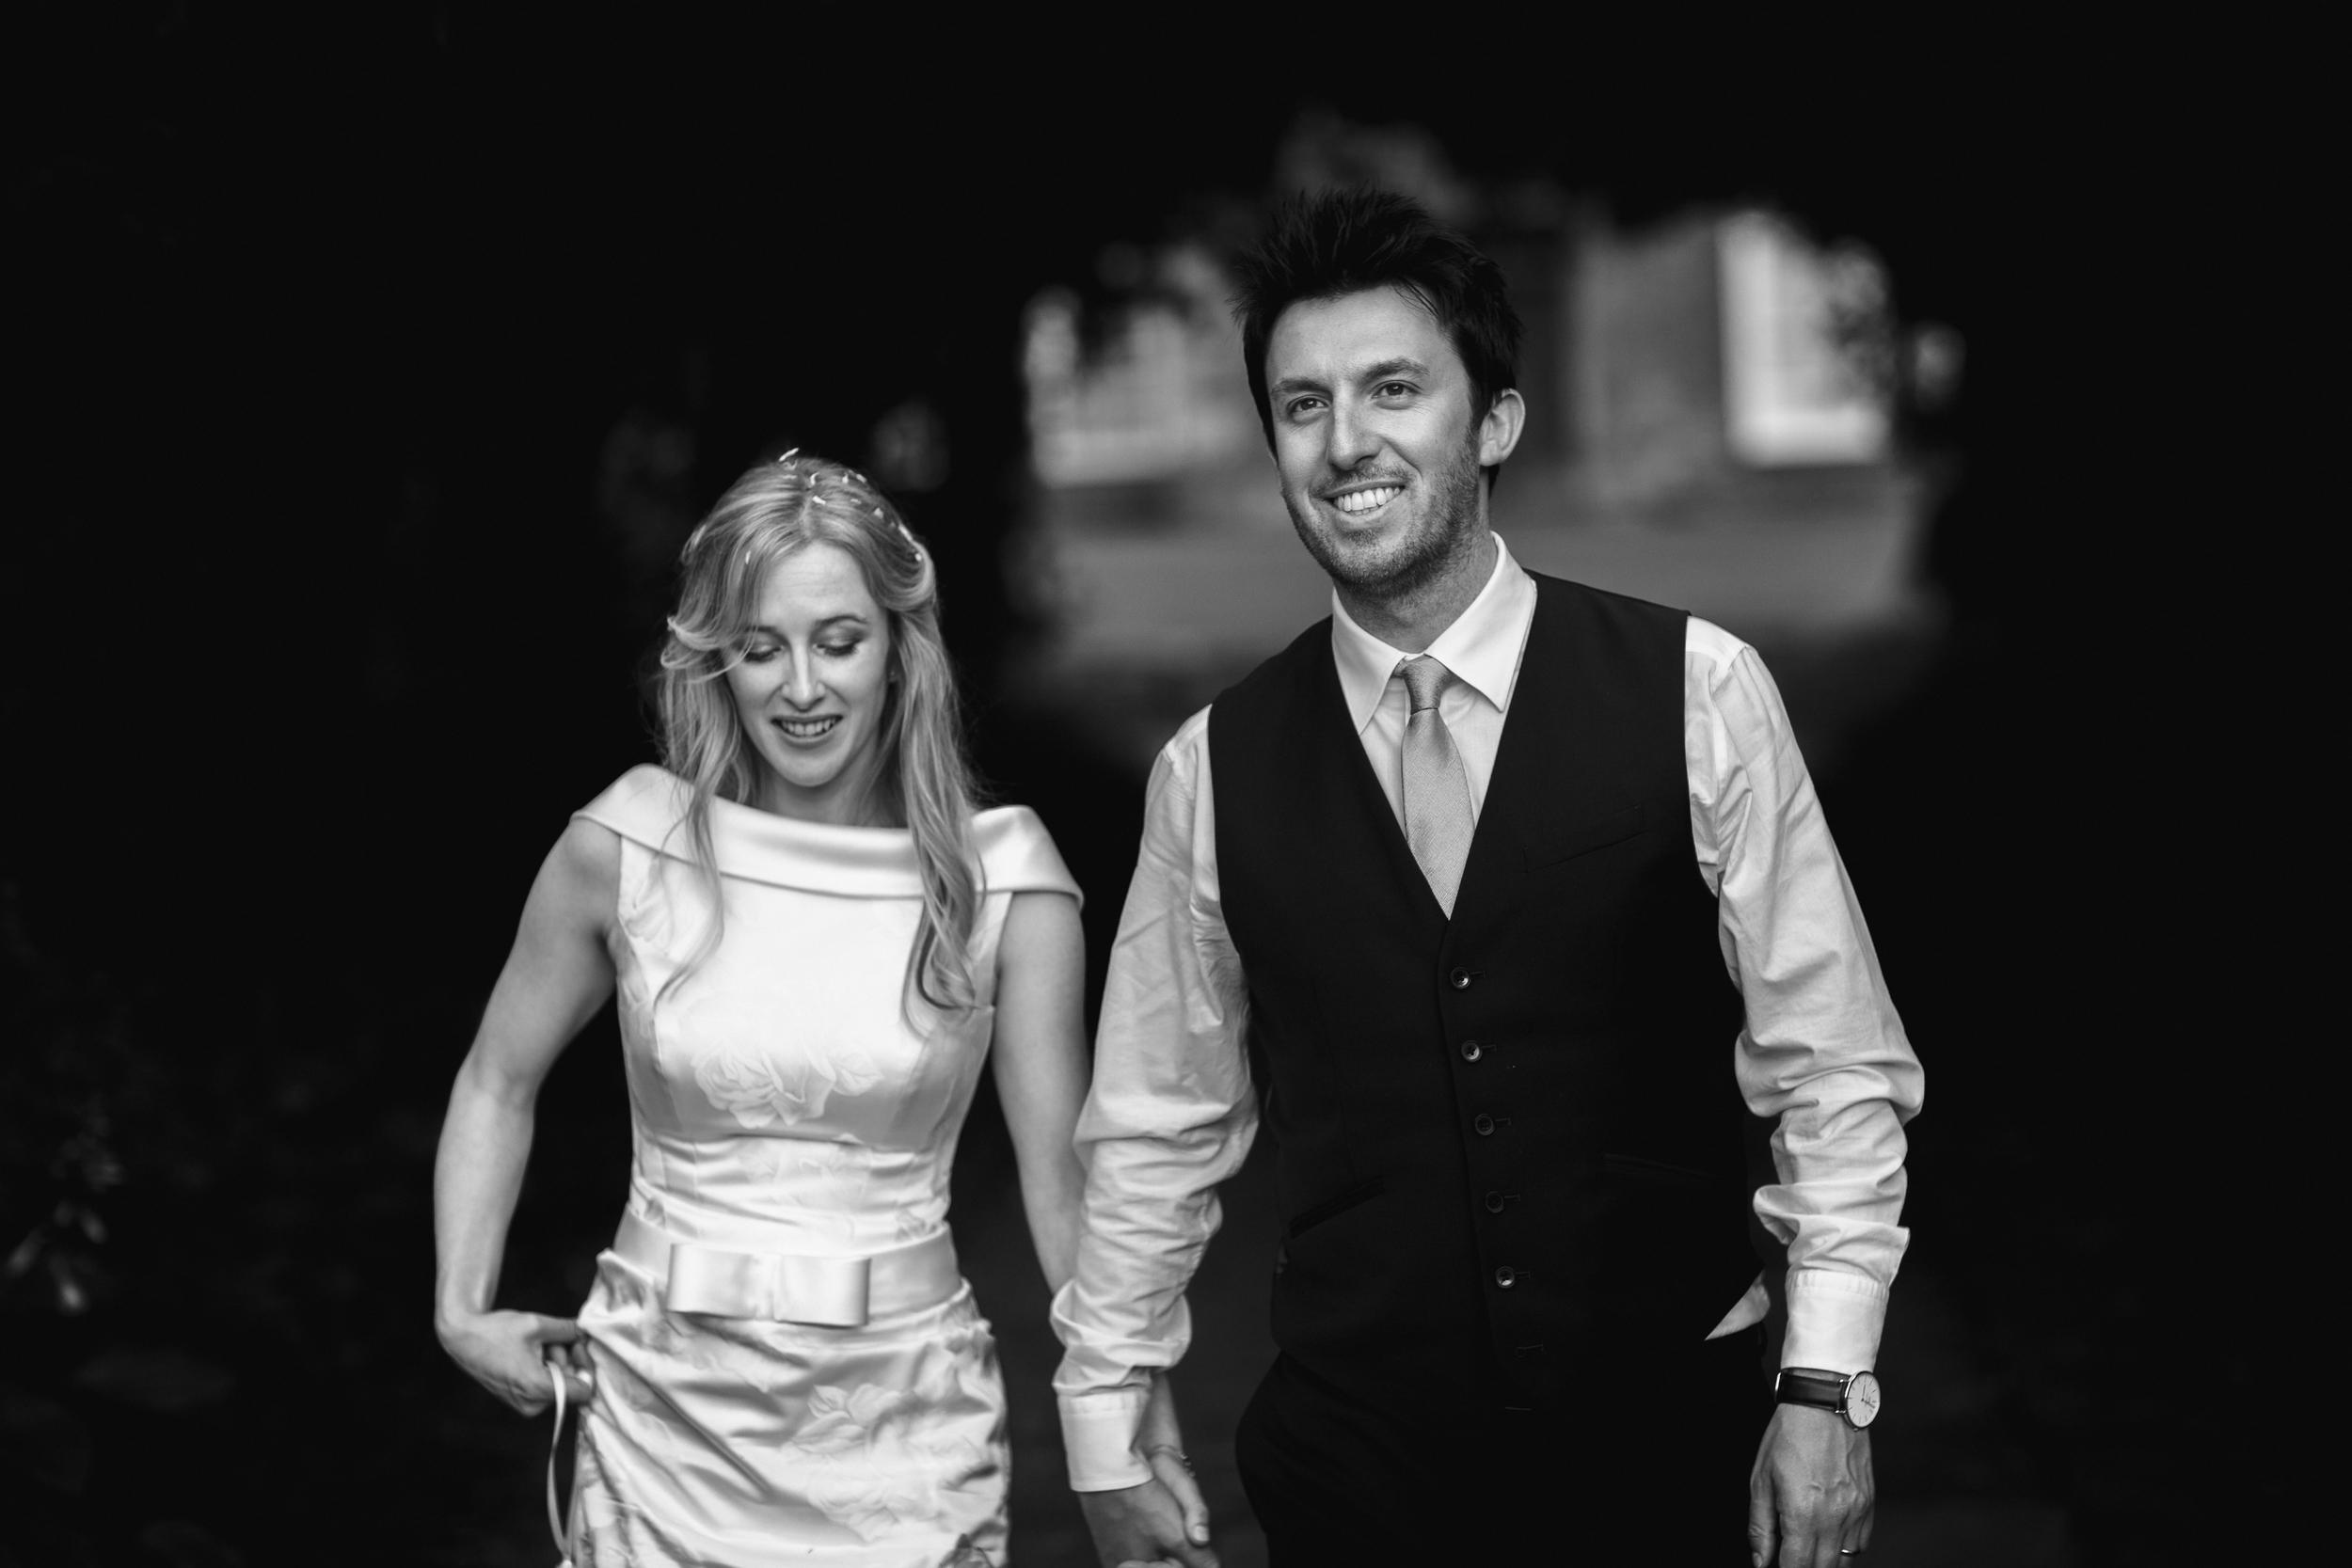 Johnny-&-Kathryn-Previews-(17-of-19).jpg